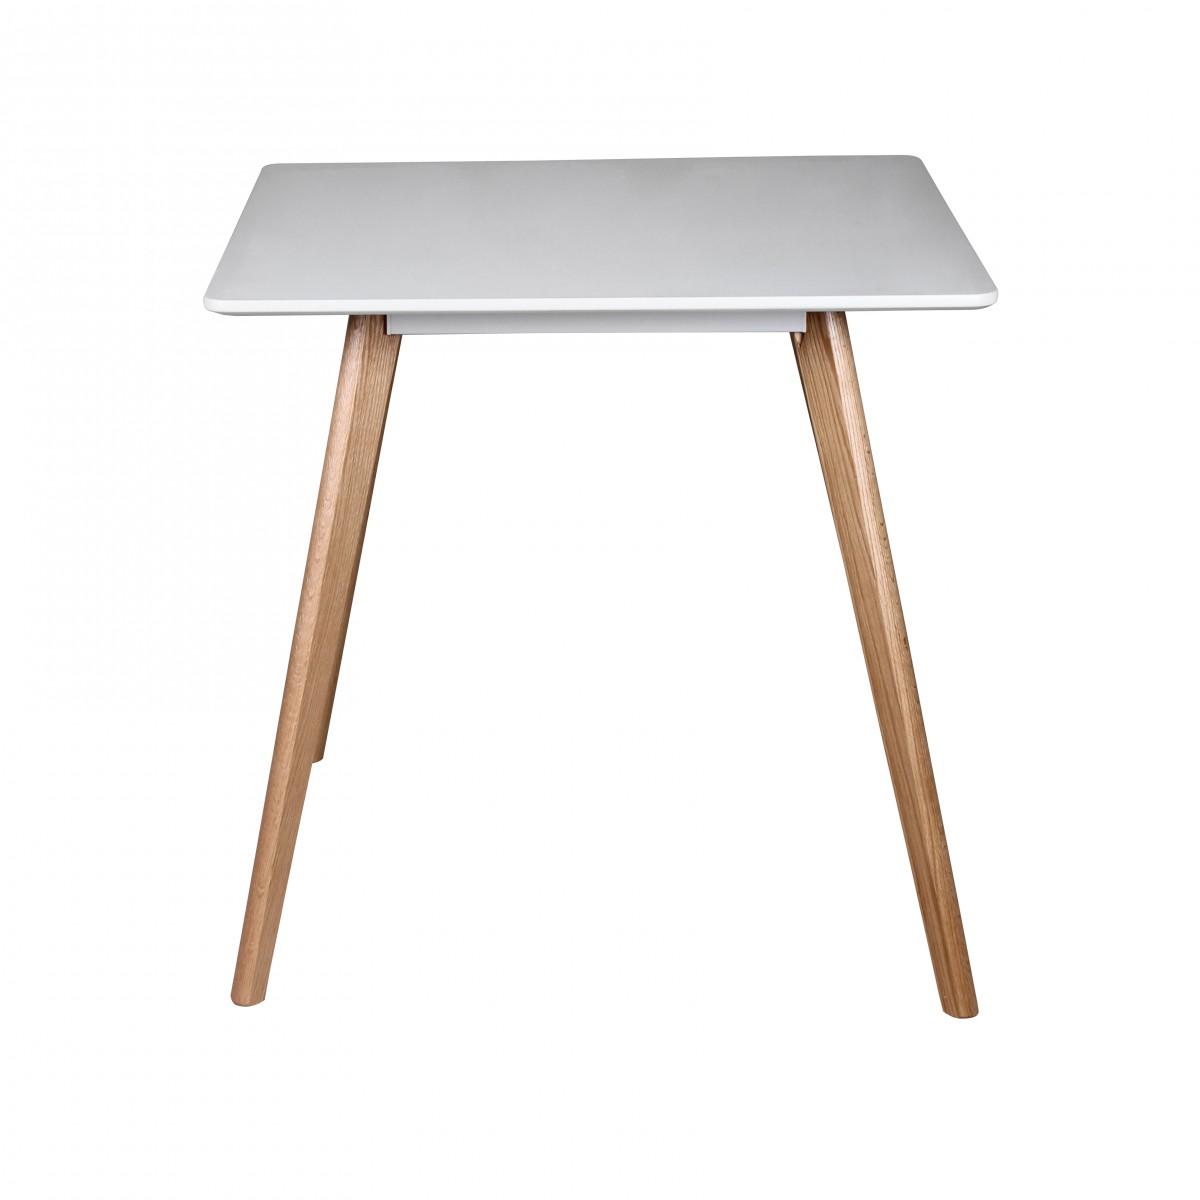 Jídelní stůl Scanio, 80 cm, bílá/dub